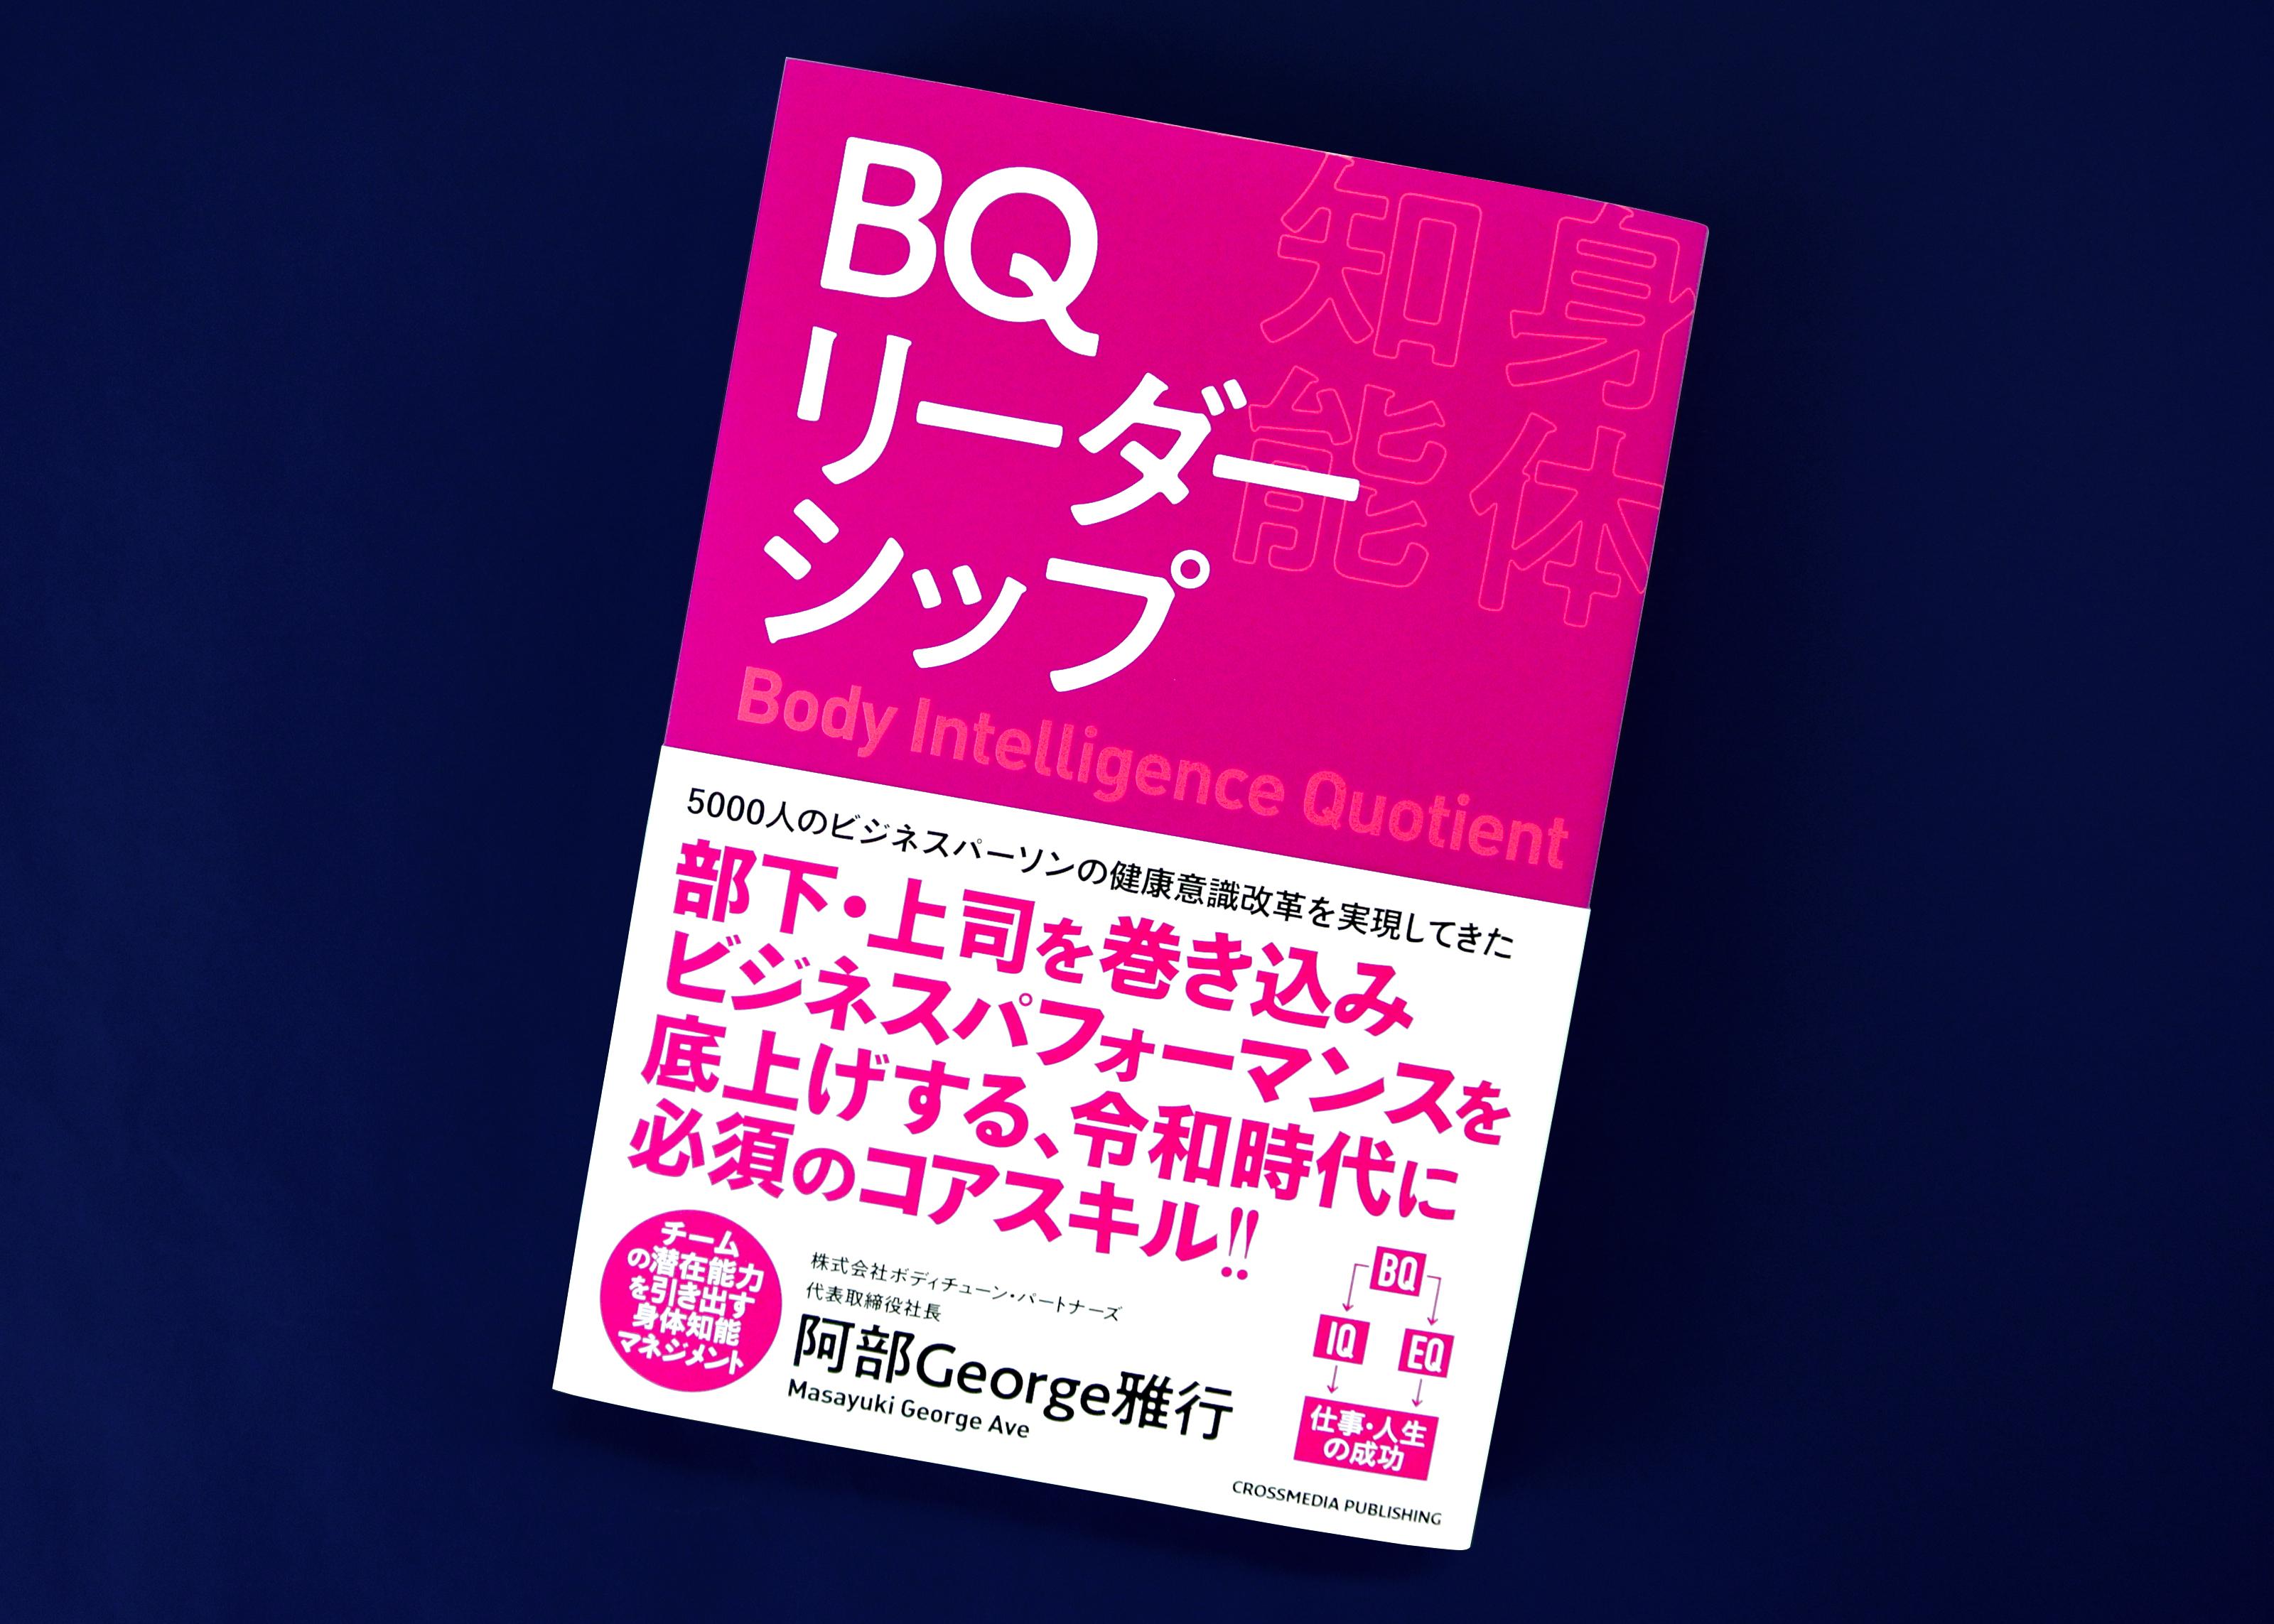 BQ ー身体知能ー リーダーシップ